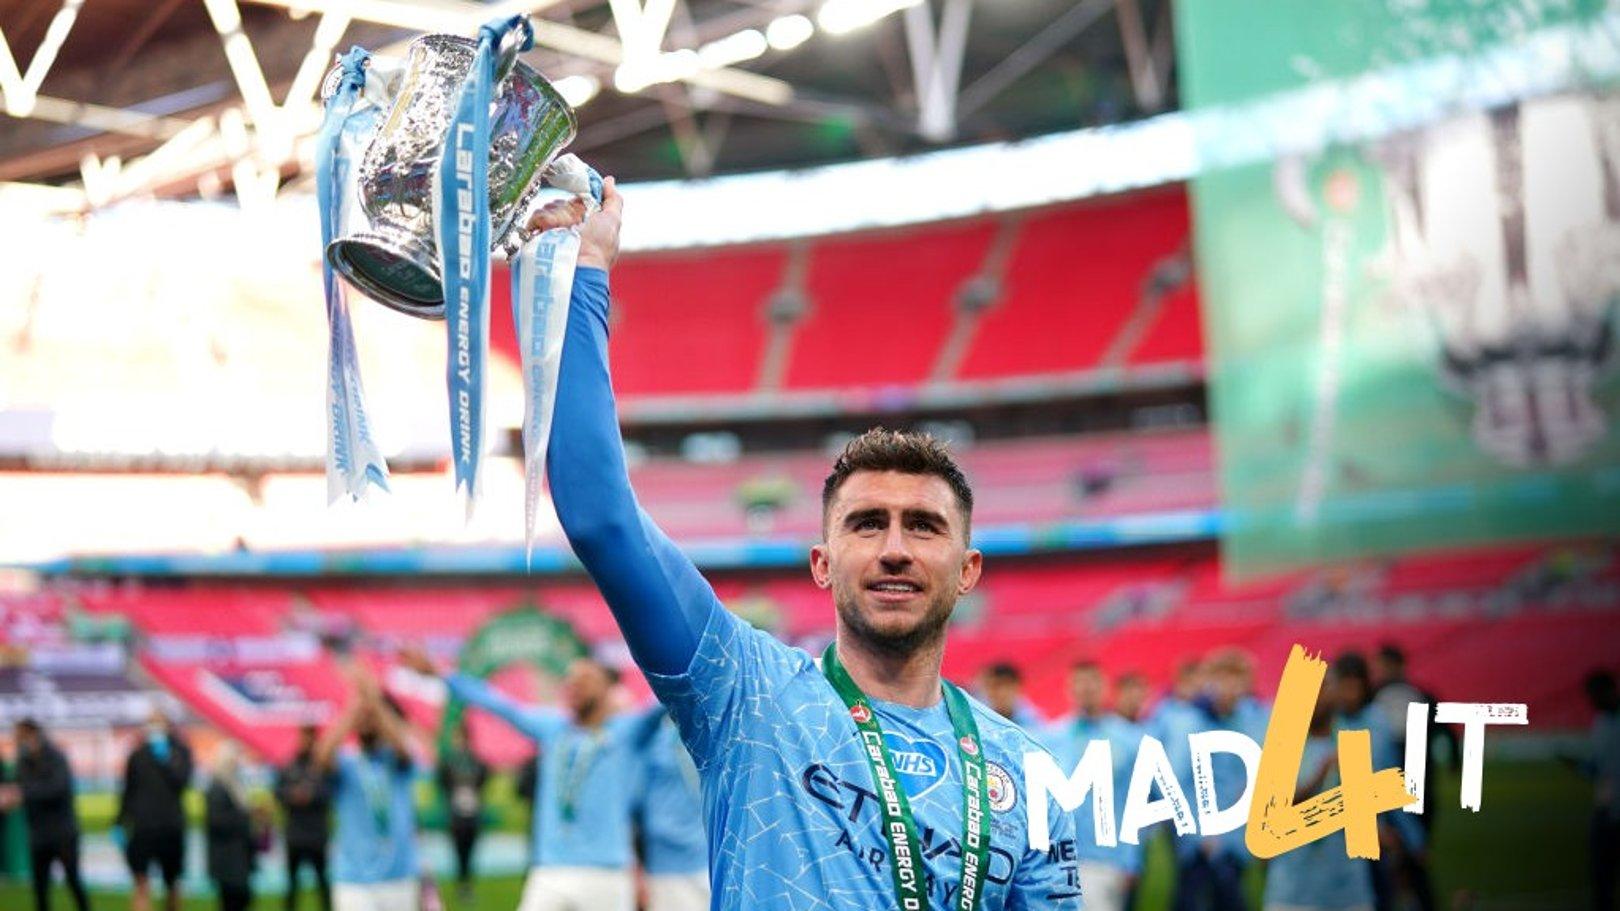 Laporte hails 'special' Carabao Cup triumph